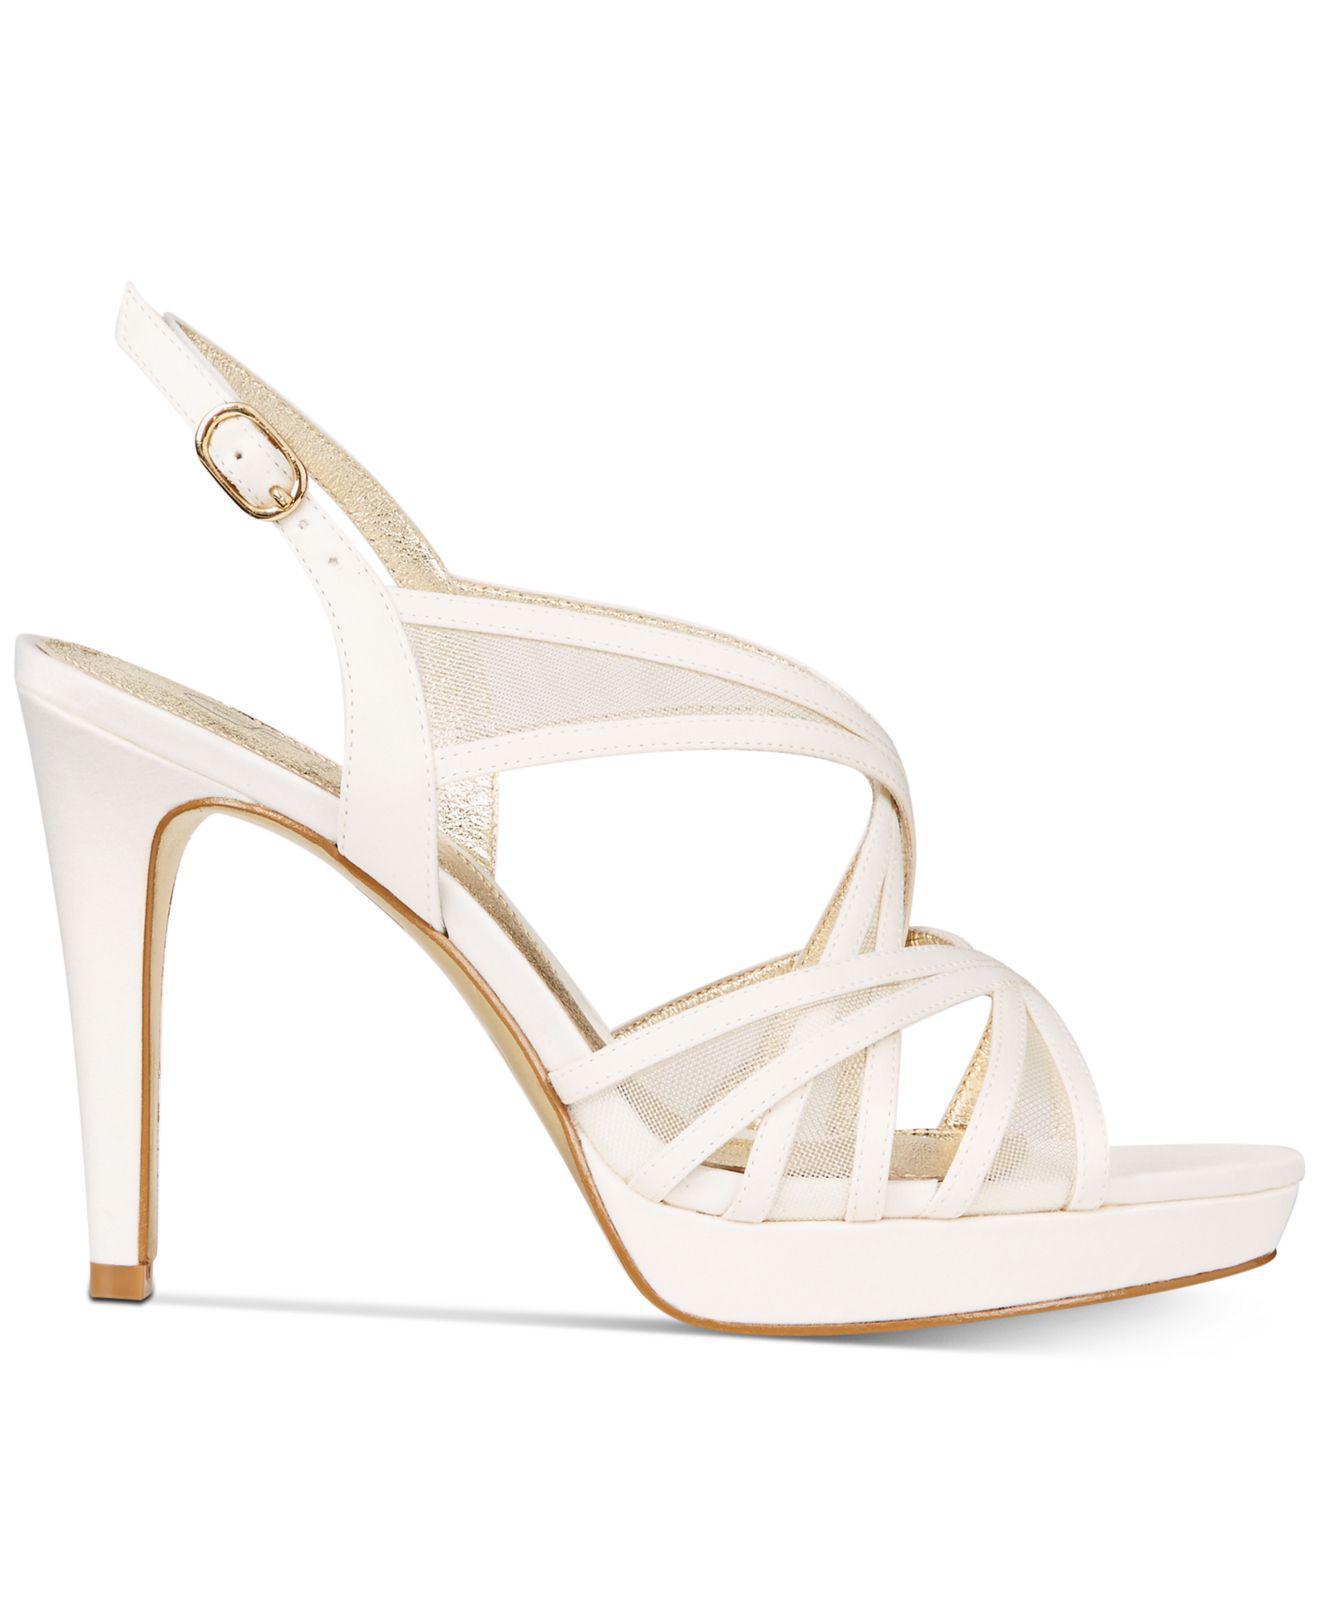 38126d586ff1 Lyst - Adrianna Papell Adri Platform Strappy Sandals in White